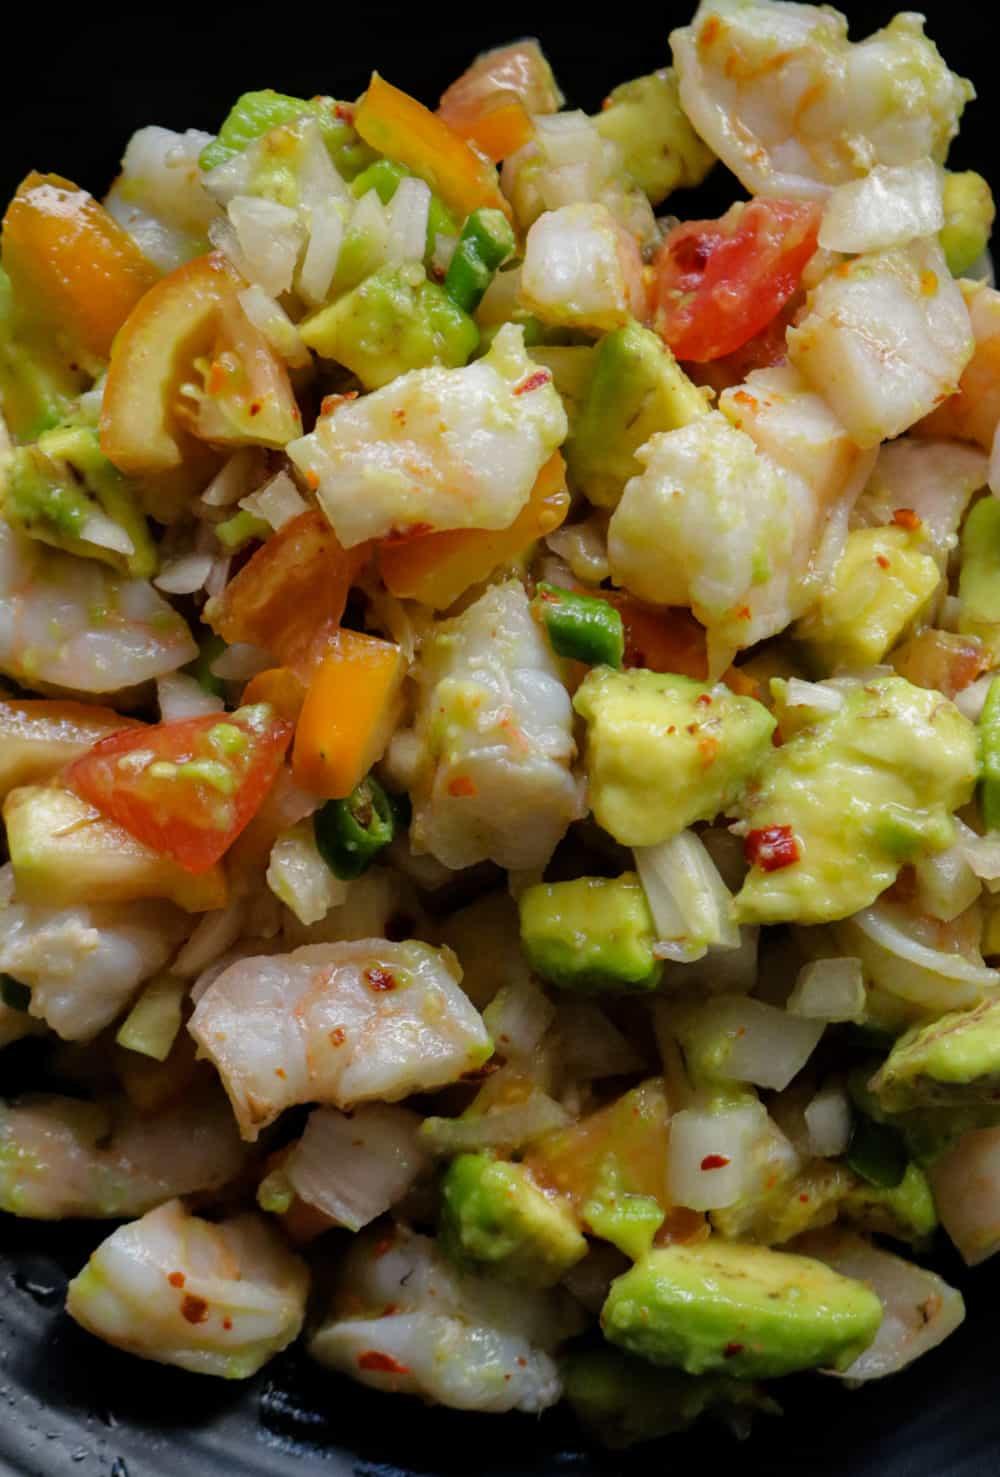 shrimp salad with avocado, onions, tomatoes.